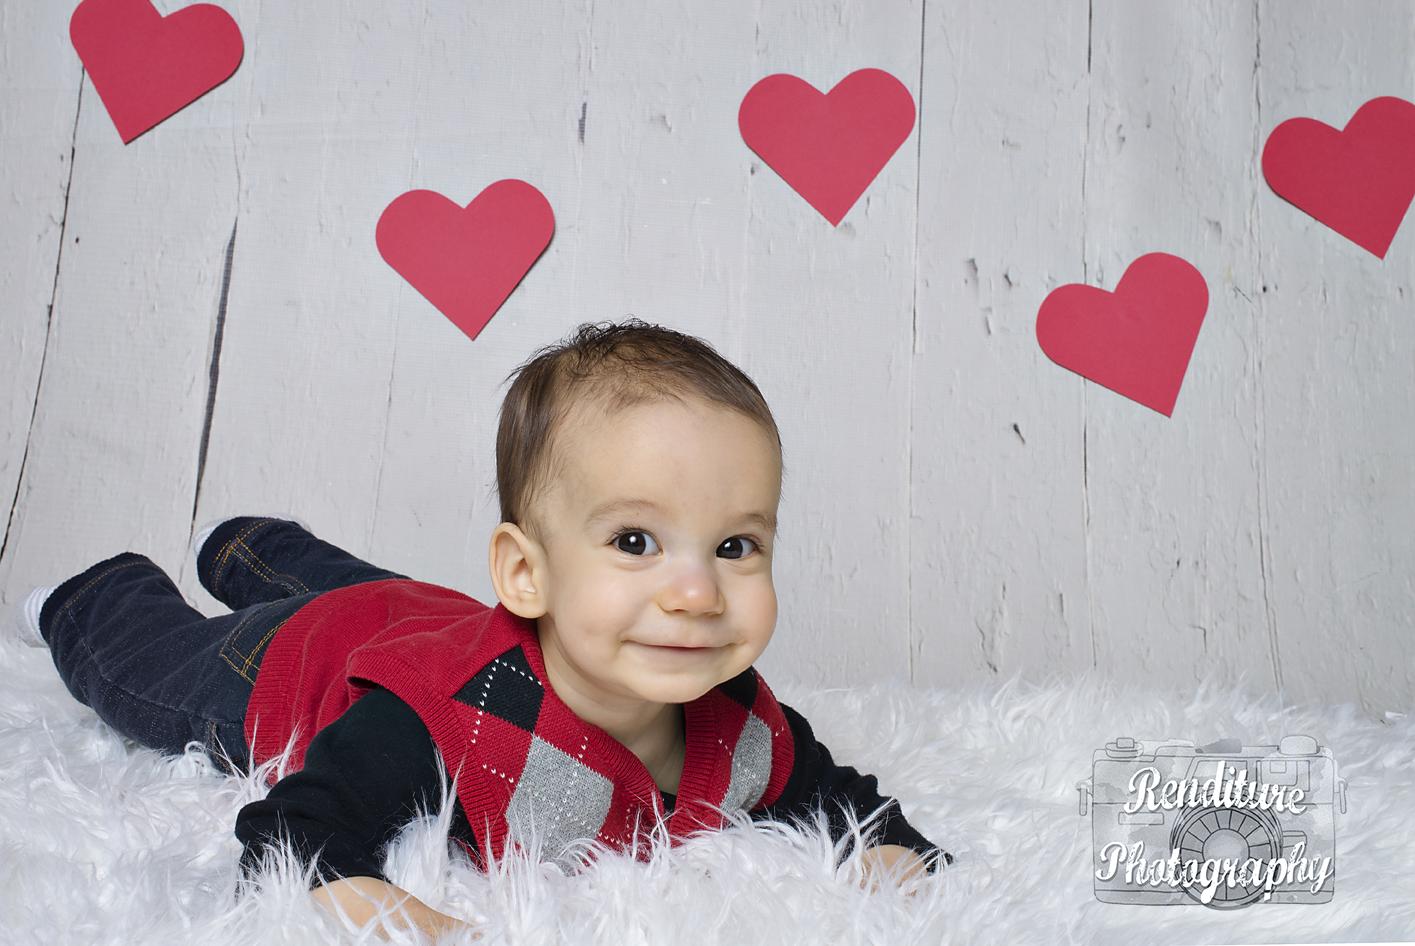 Saskatoon-Newborn-Family-Renditure-Baby-Photography-Photographer-Maternity-Pregnancy-Saskatchewan-167mFBR.png